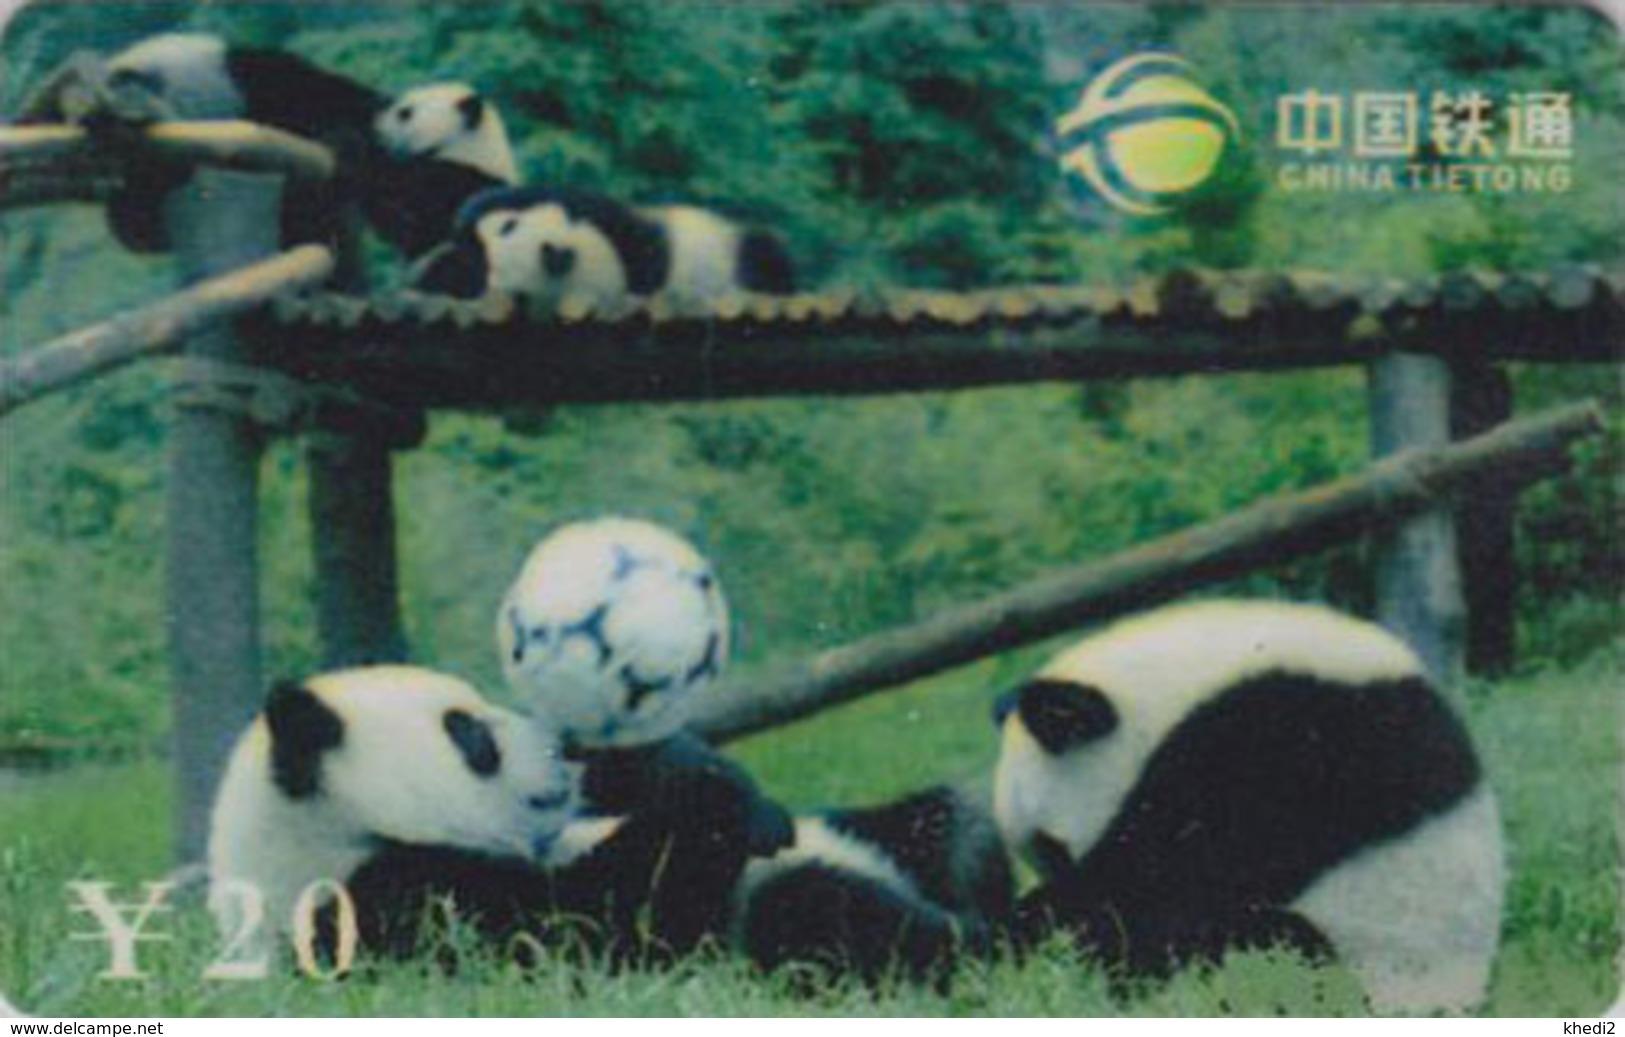 Télécarte De Chine - Animal - PANDA GEANT & Ballon De Football - China Tietong Phonecard - 453 - Chine